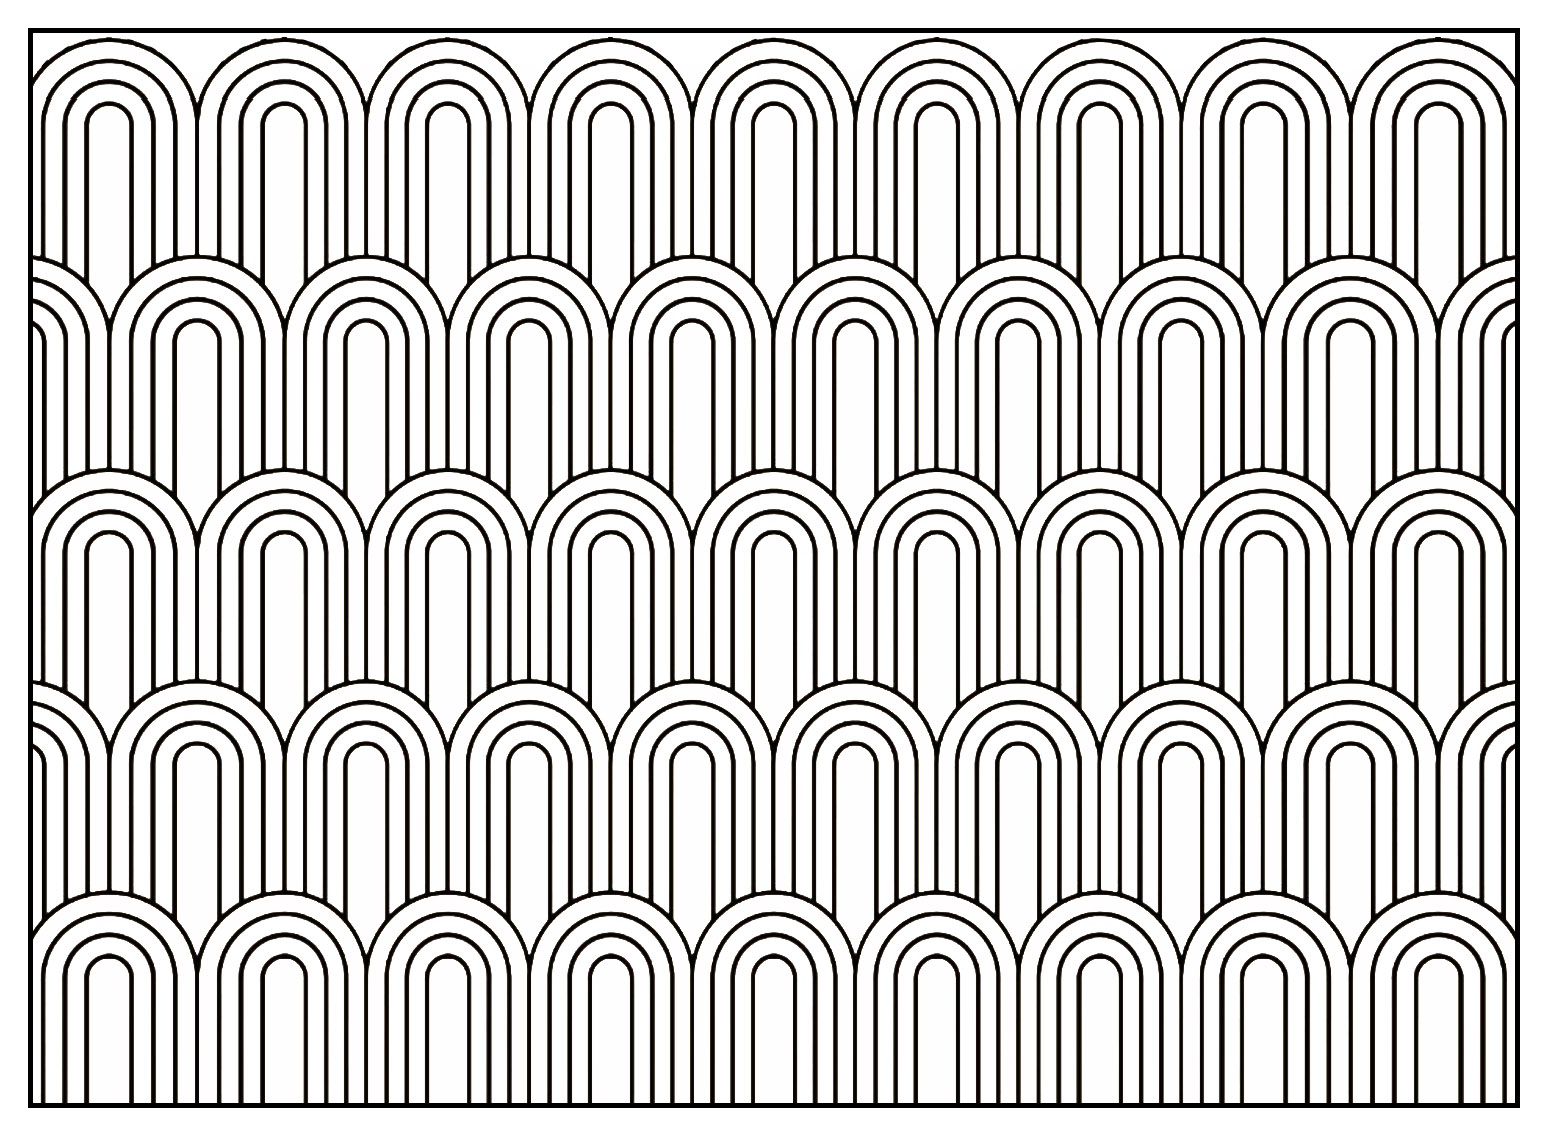 Geometric patterns art deco 7 - Art Deco Adult Coloring Pages